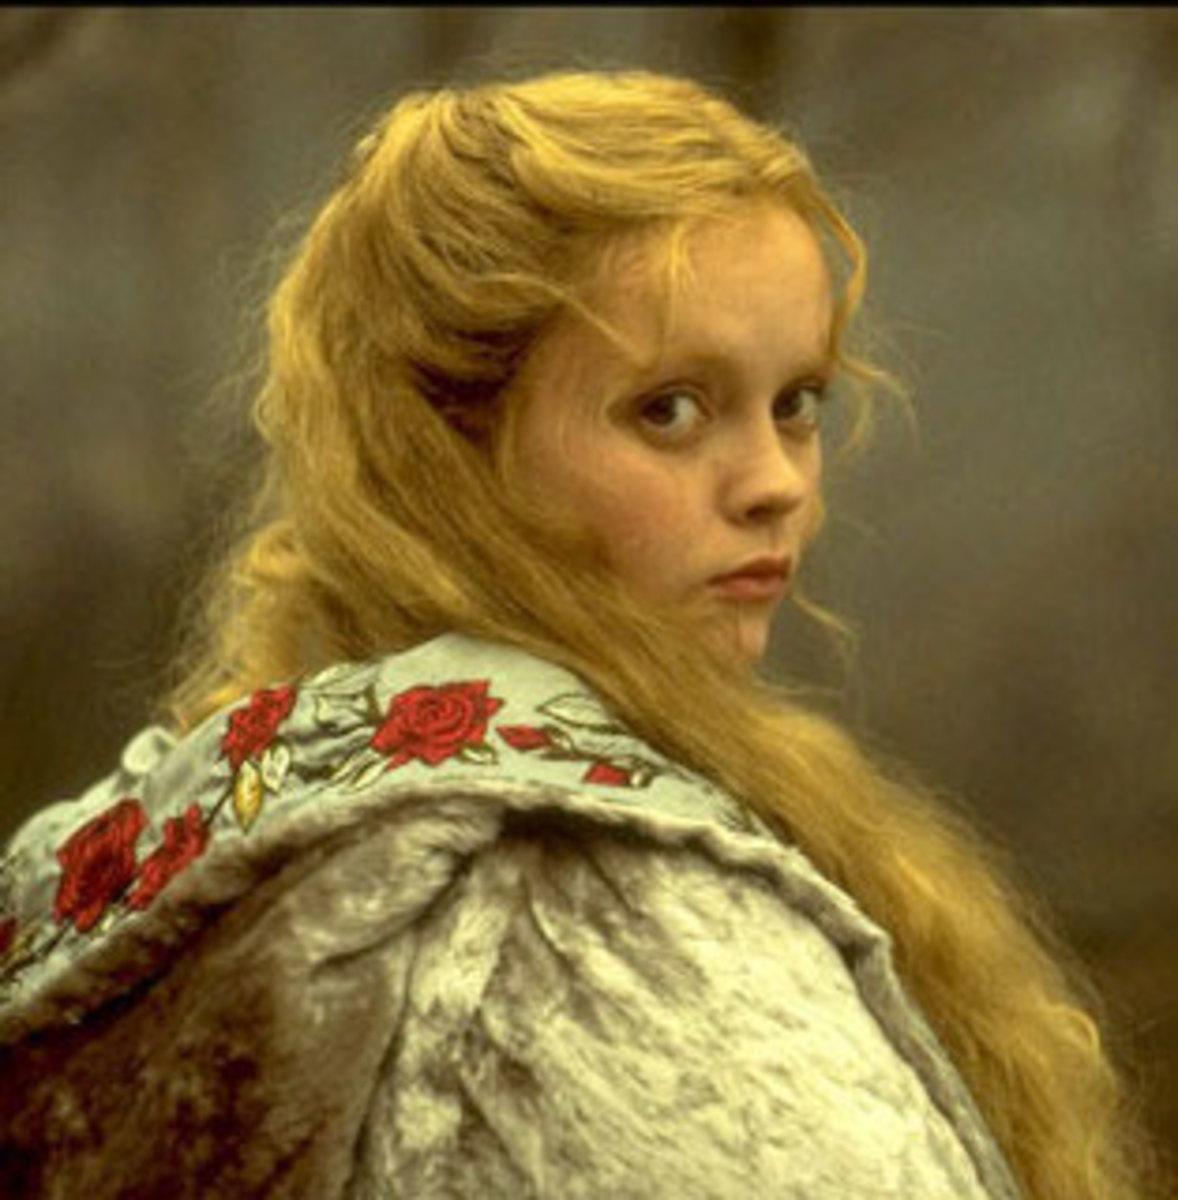 Christina Ricci as Katrina Van Tassel from Sleepy Hollow